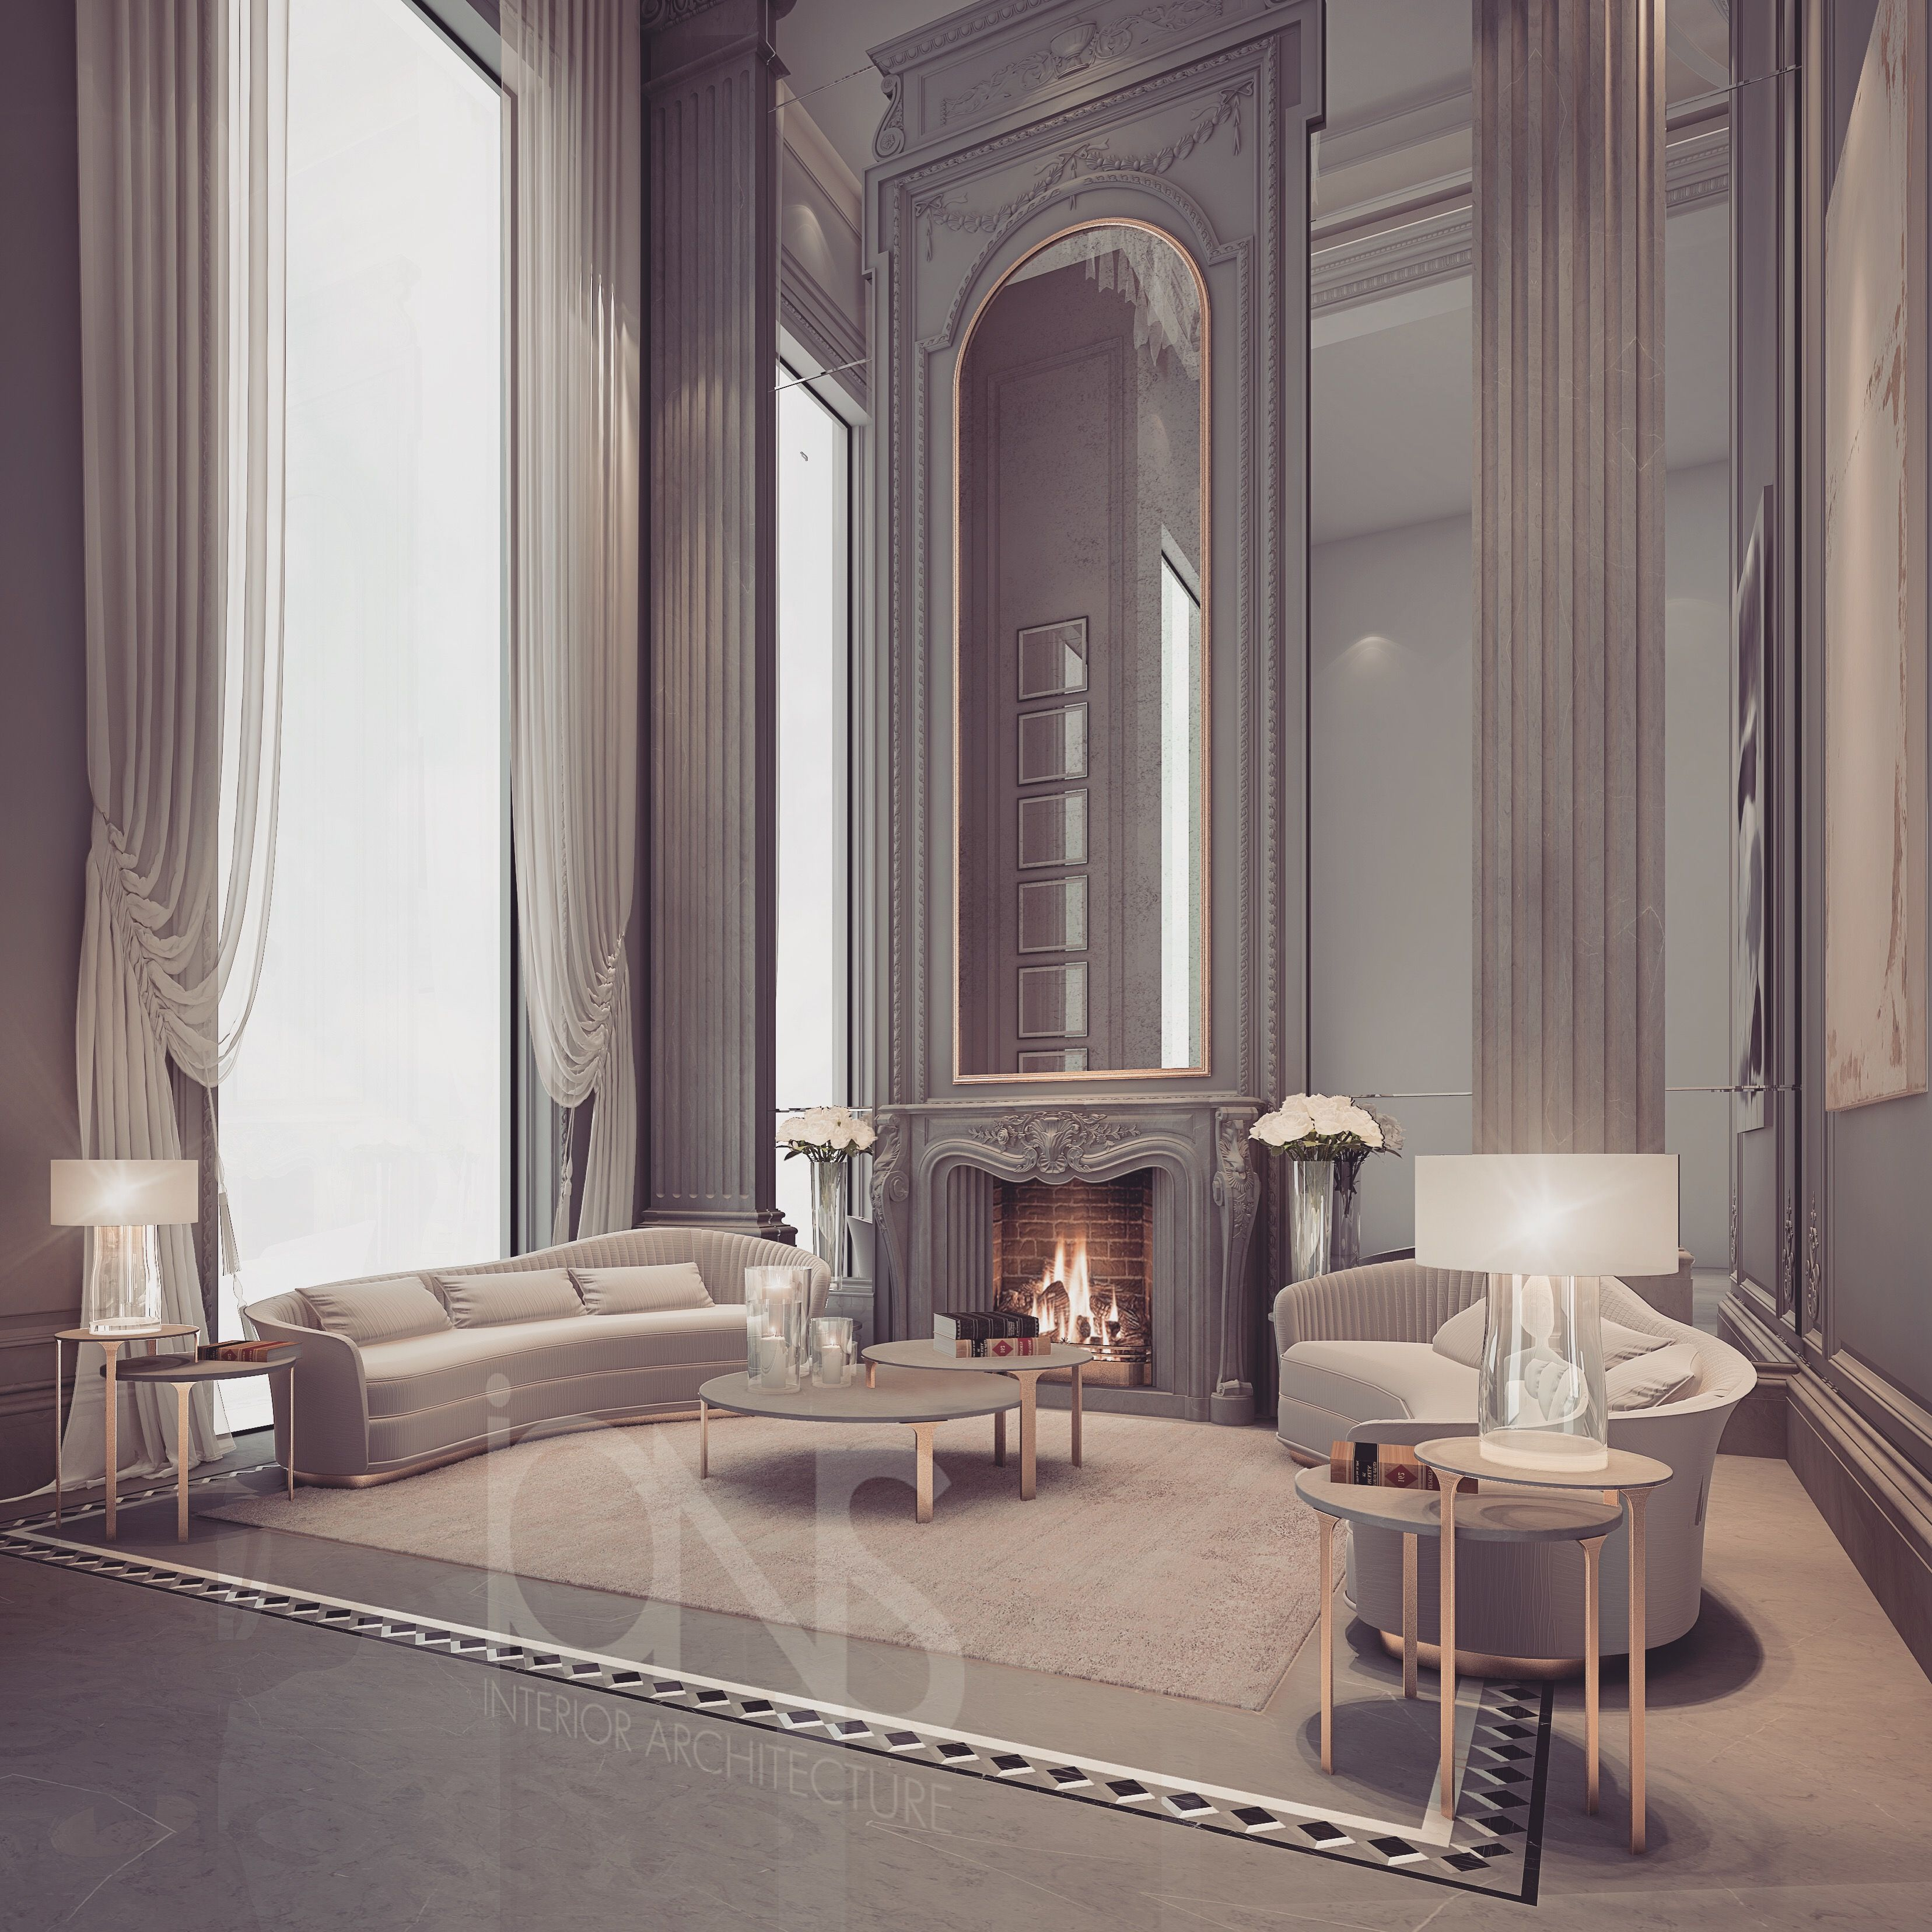 Luxury Residence By Dallas Design: Lounge Design - Abu Dhabi - UAE By Ions Design